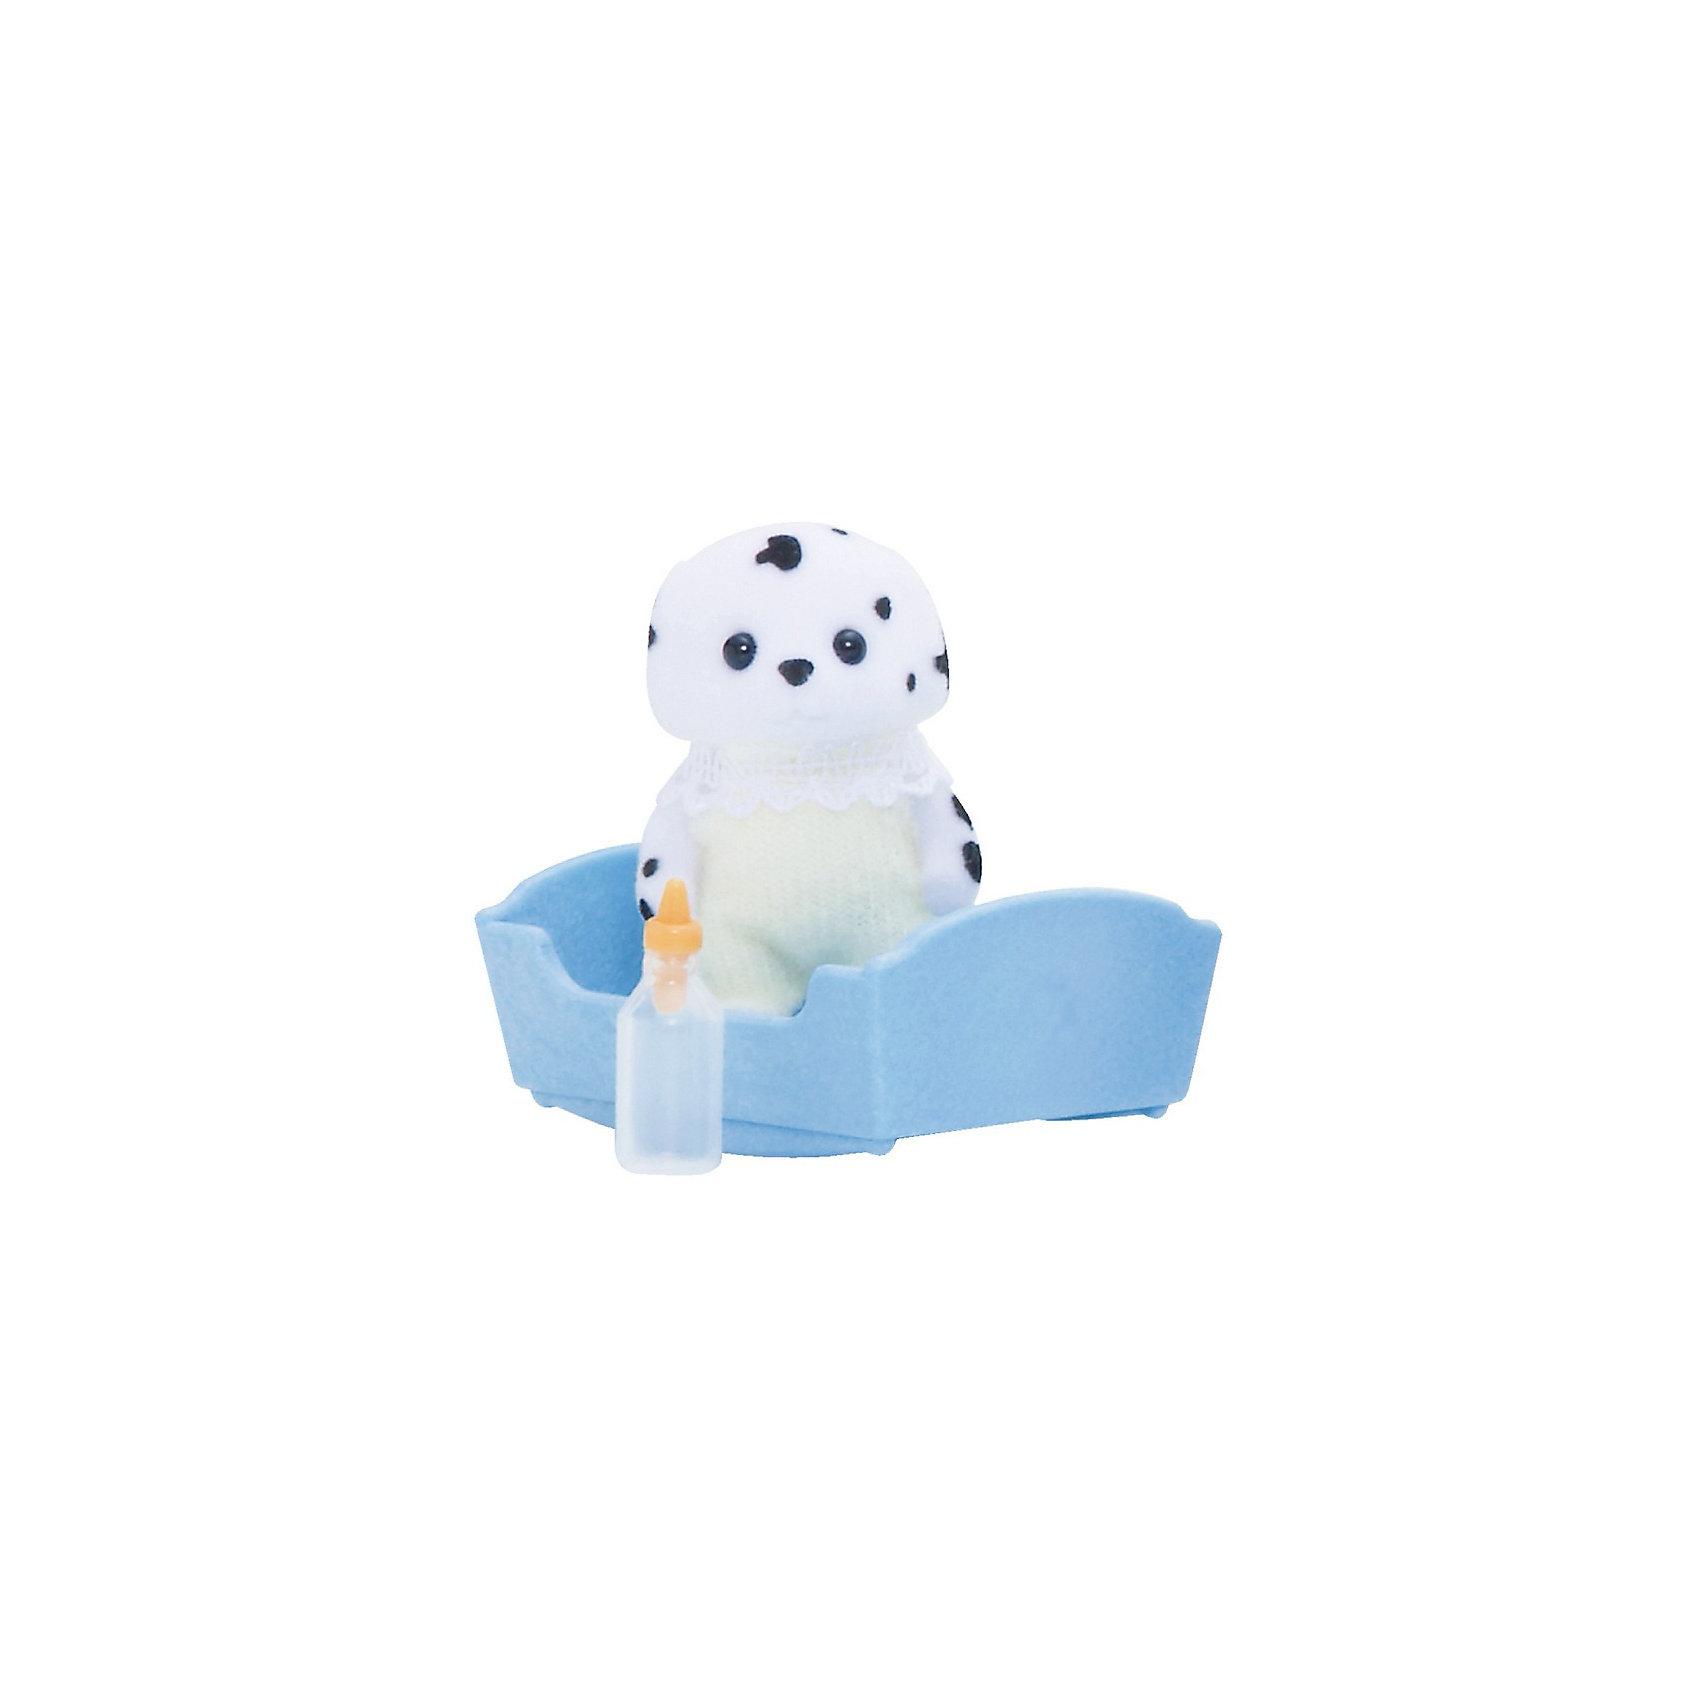 - Набор Малыш Далматин, Sylvanian Families фигурки игрушки sylvanian families набор малыш щенок